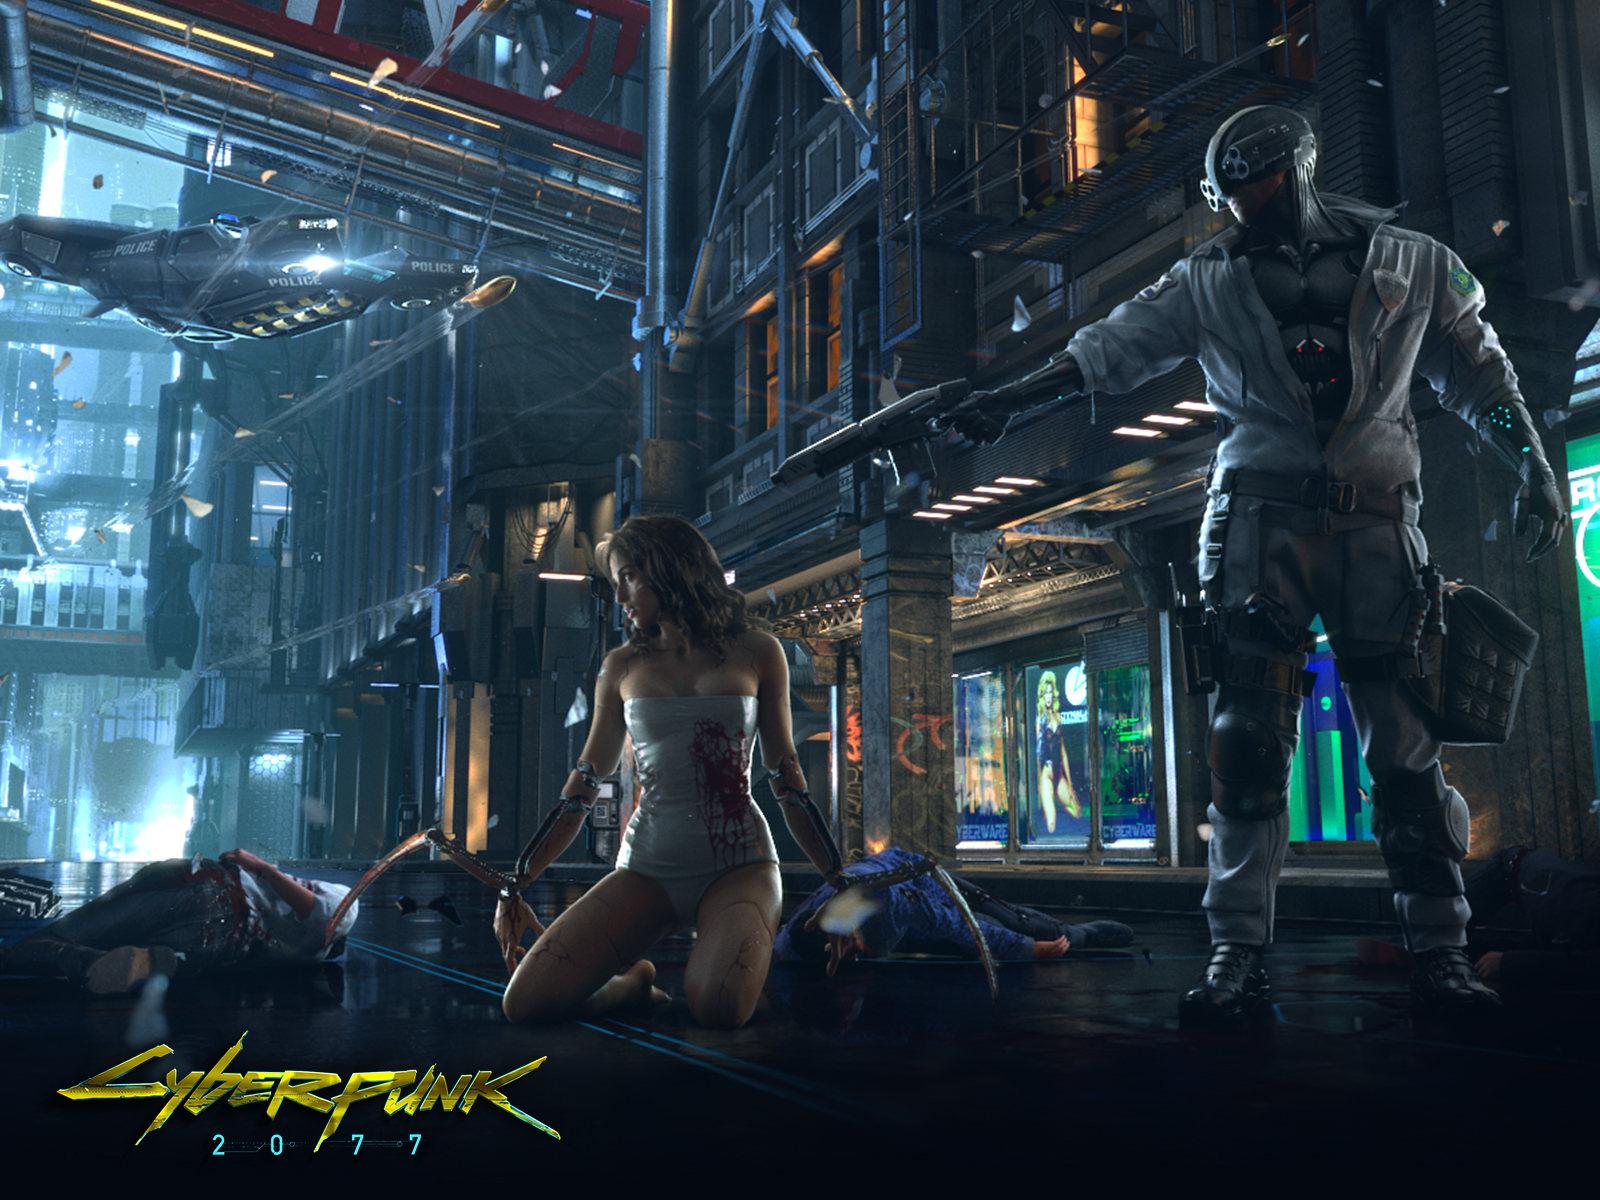 Cyberpunk 2077 (Trailer)